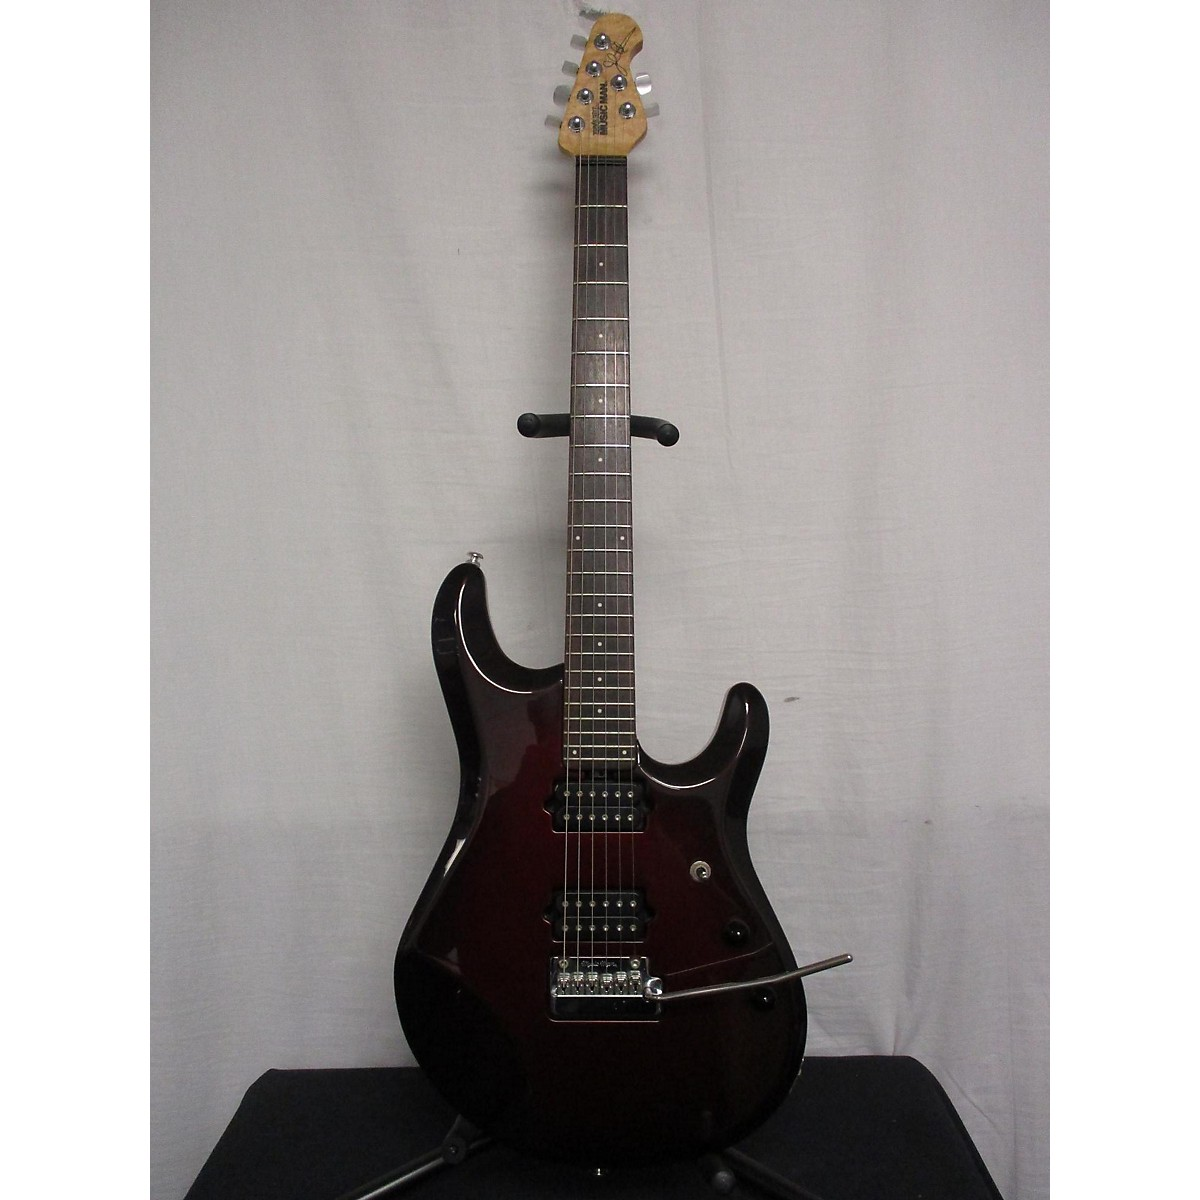 Ernie Ball 2002 PETRUCCI Solid Body Electric Guitar